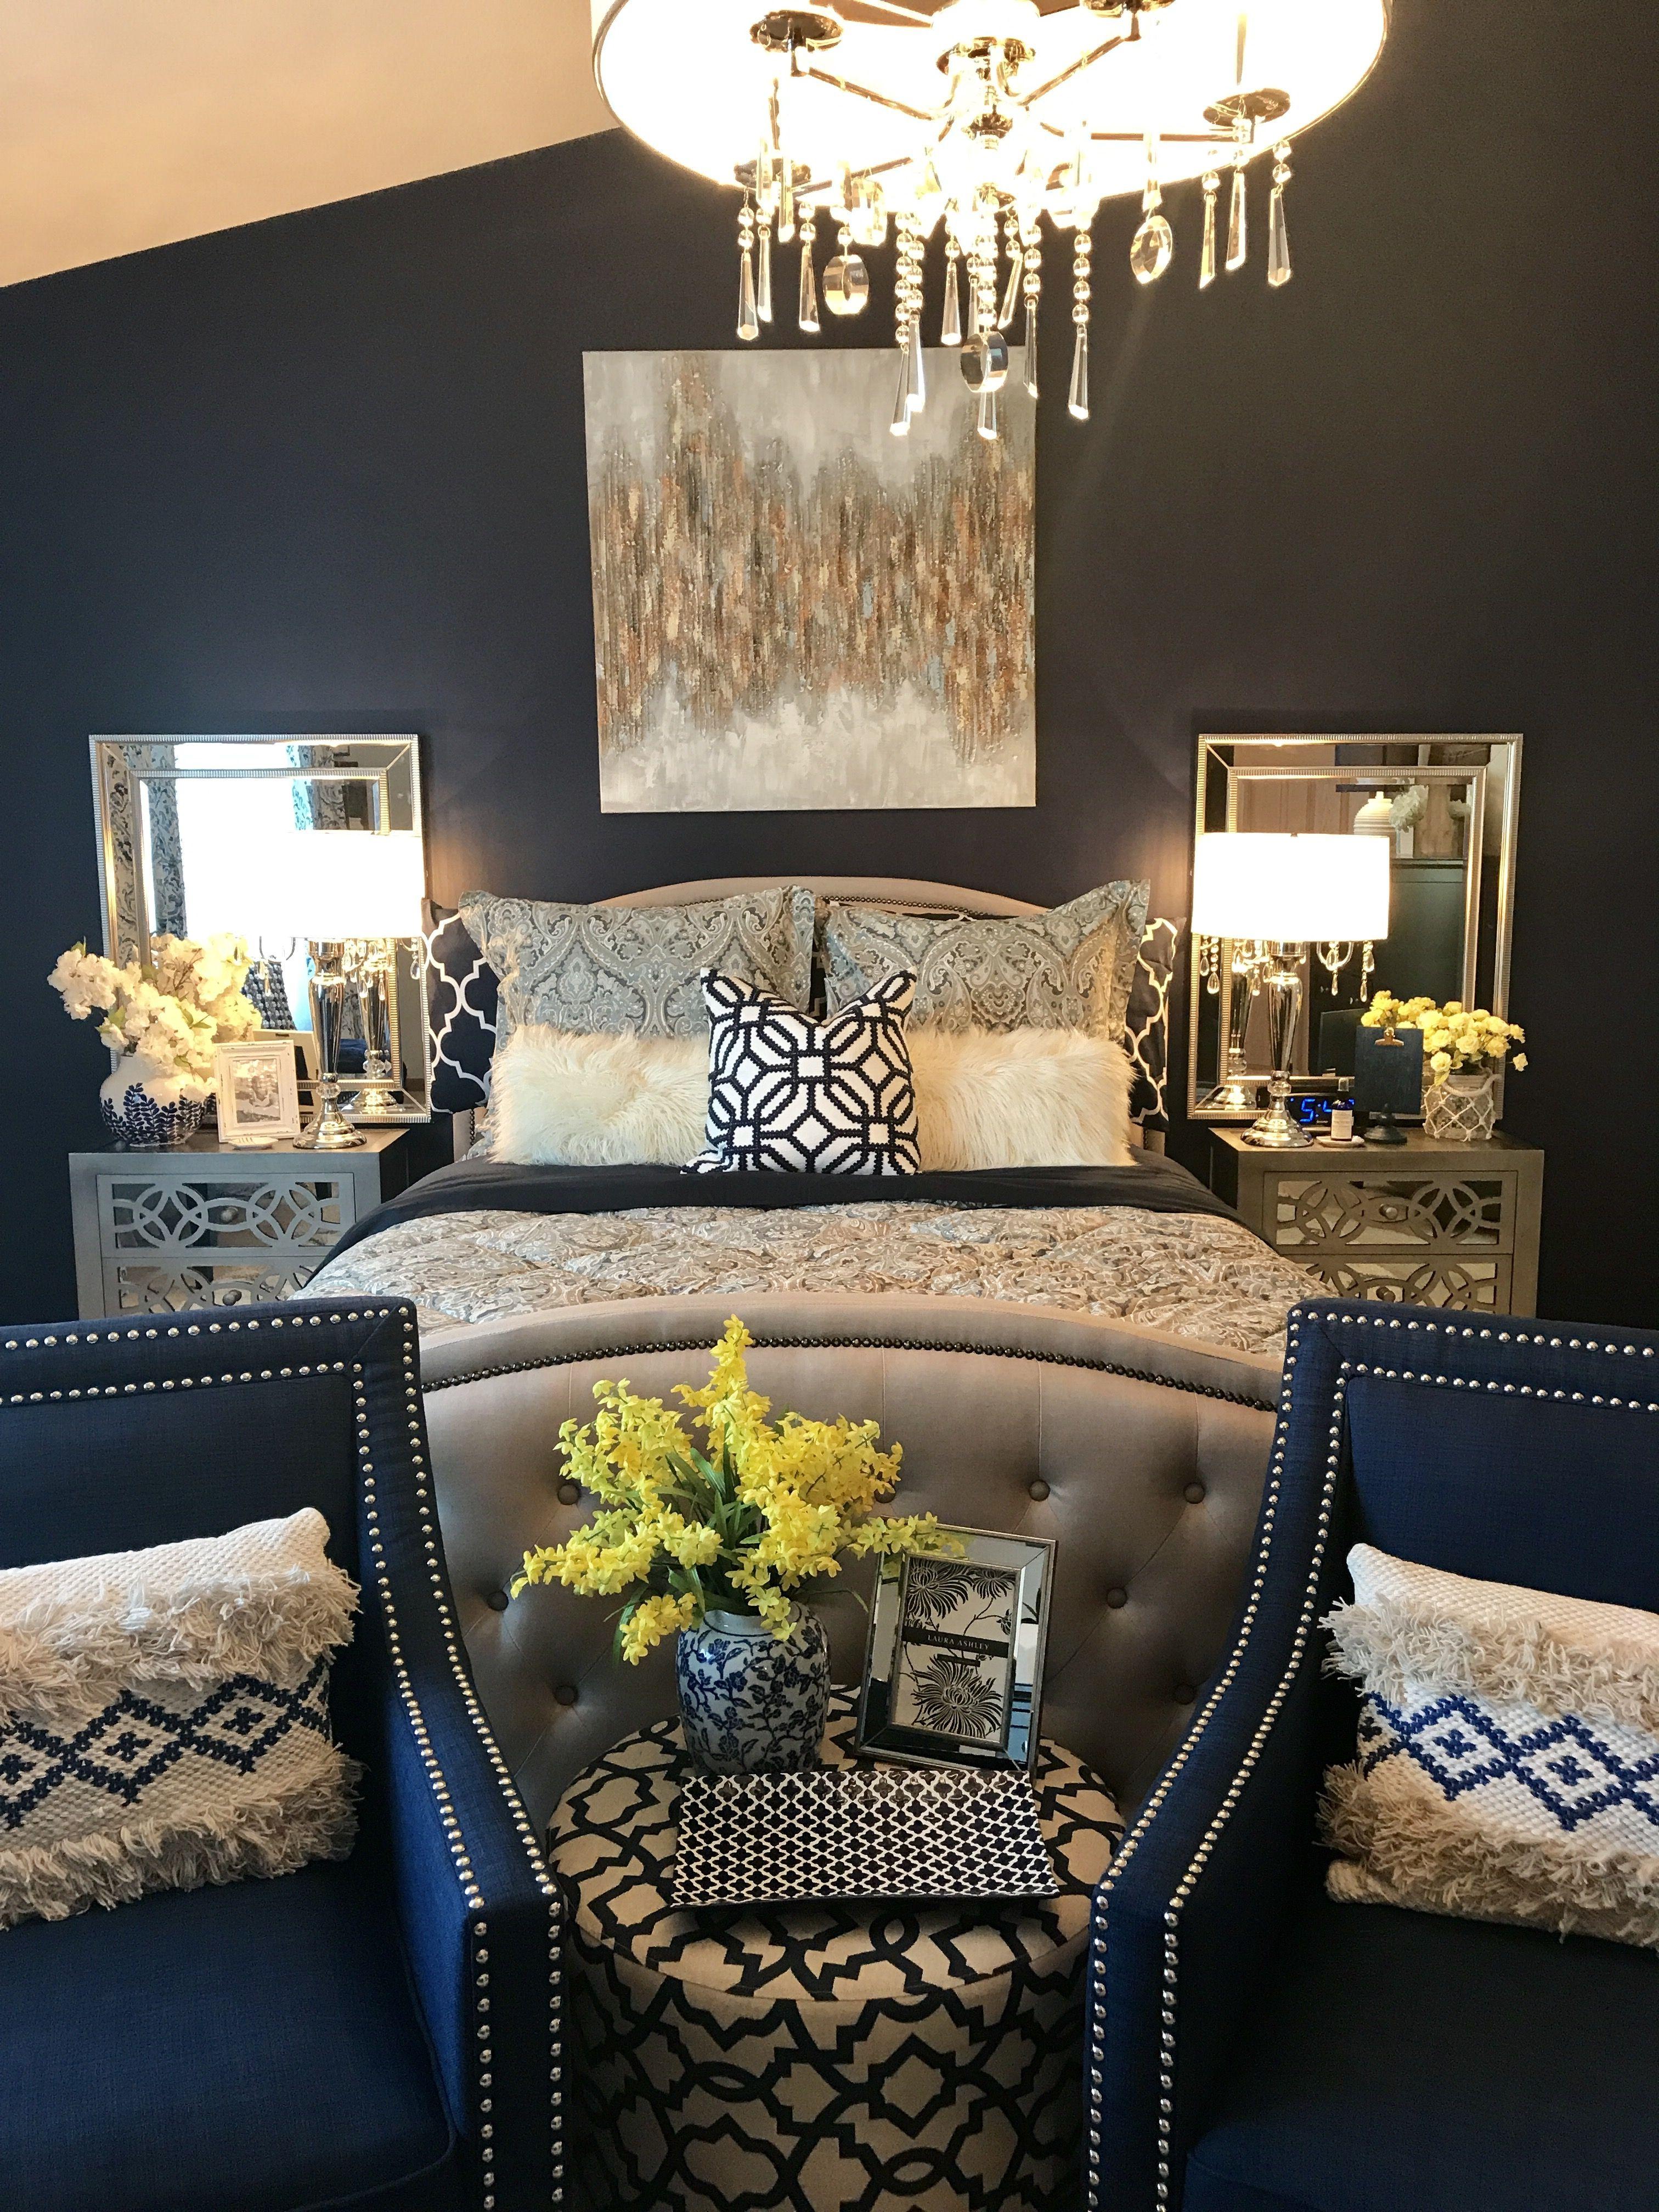 yellow door interior navy and grey master bedroom decor on romantic trend master bedroom ideas id=37335